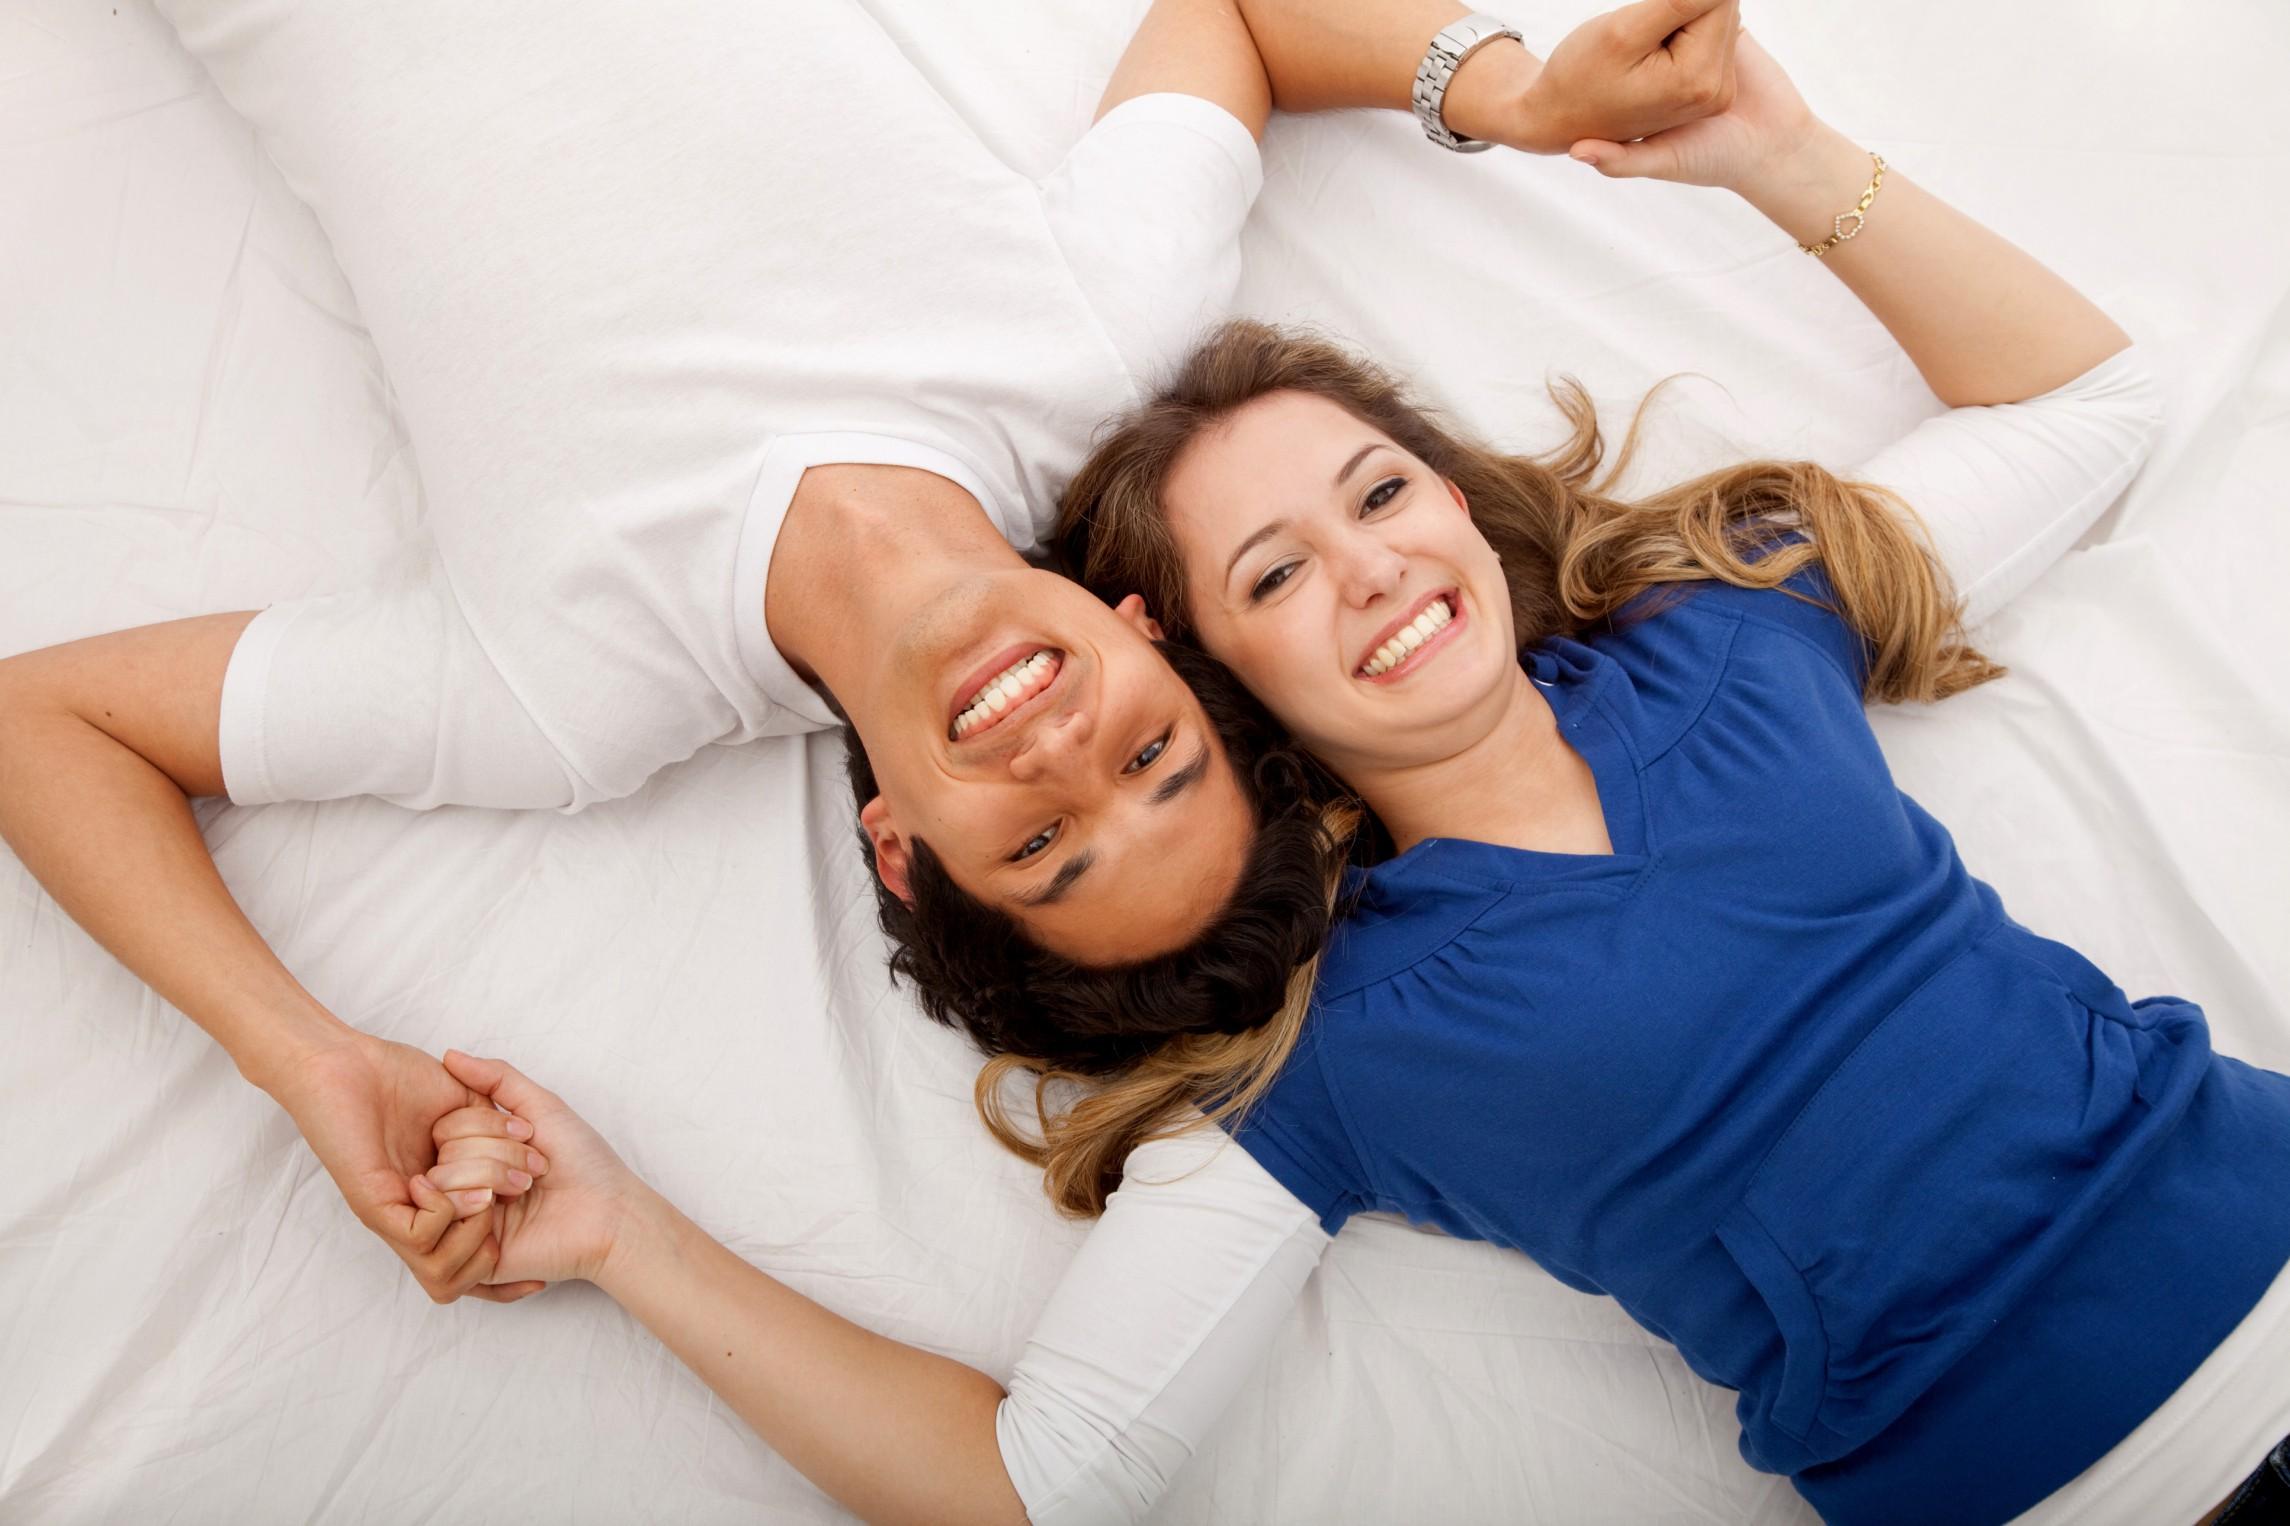 Photo of فواید شگفت انگیز رابطه جنسی که عالی هستند + 10 فایده رابطه جنسی